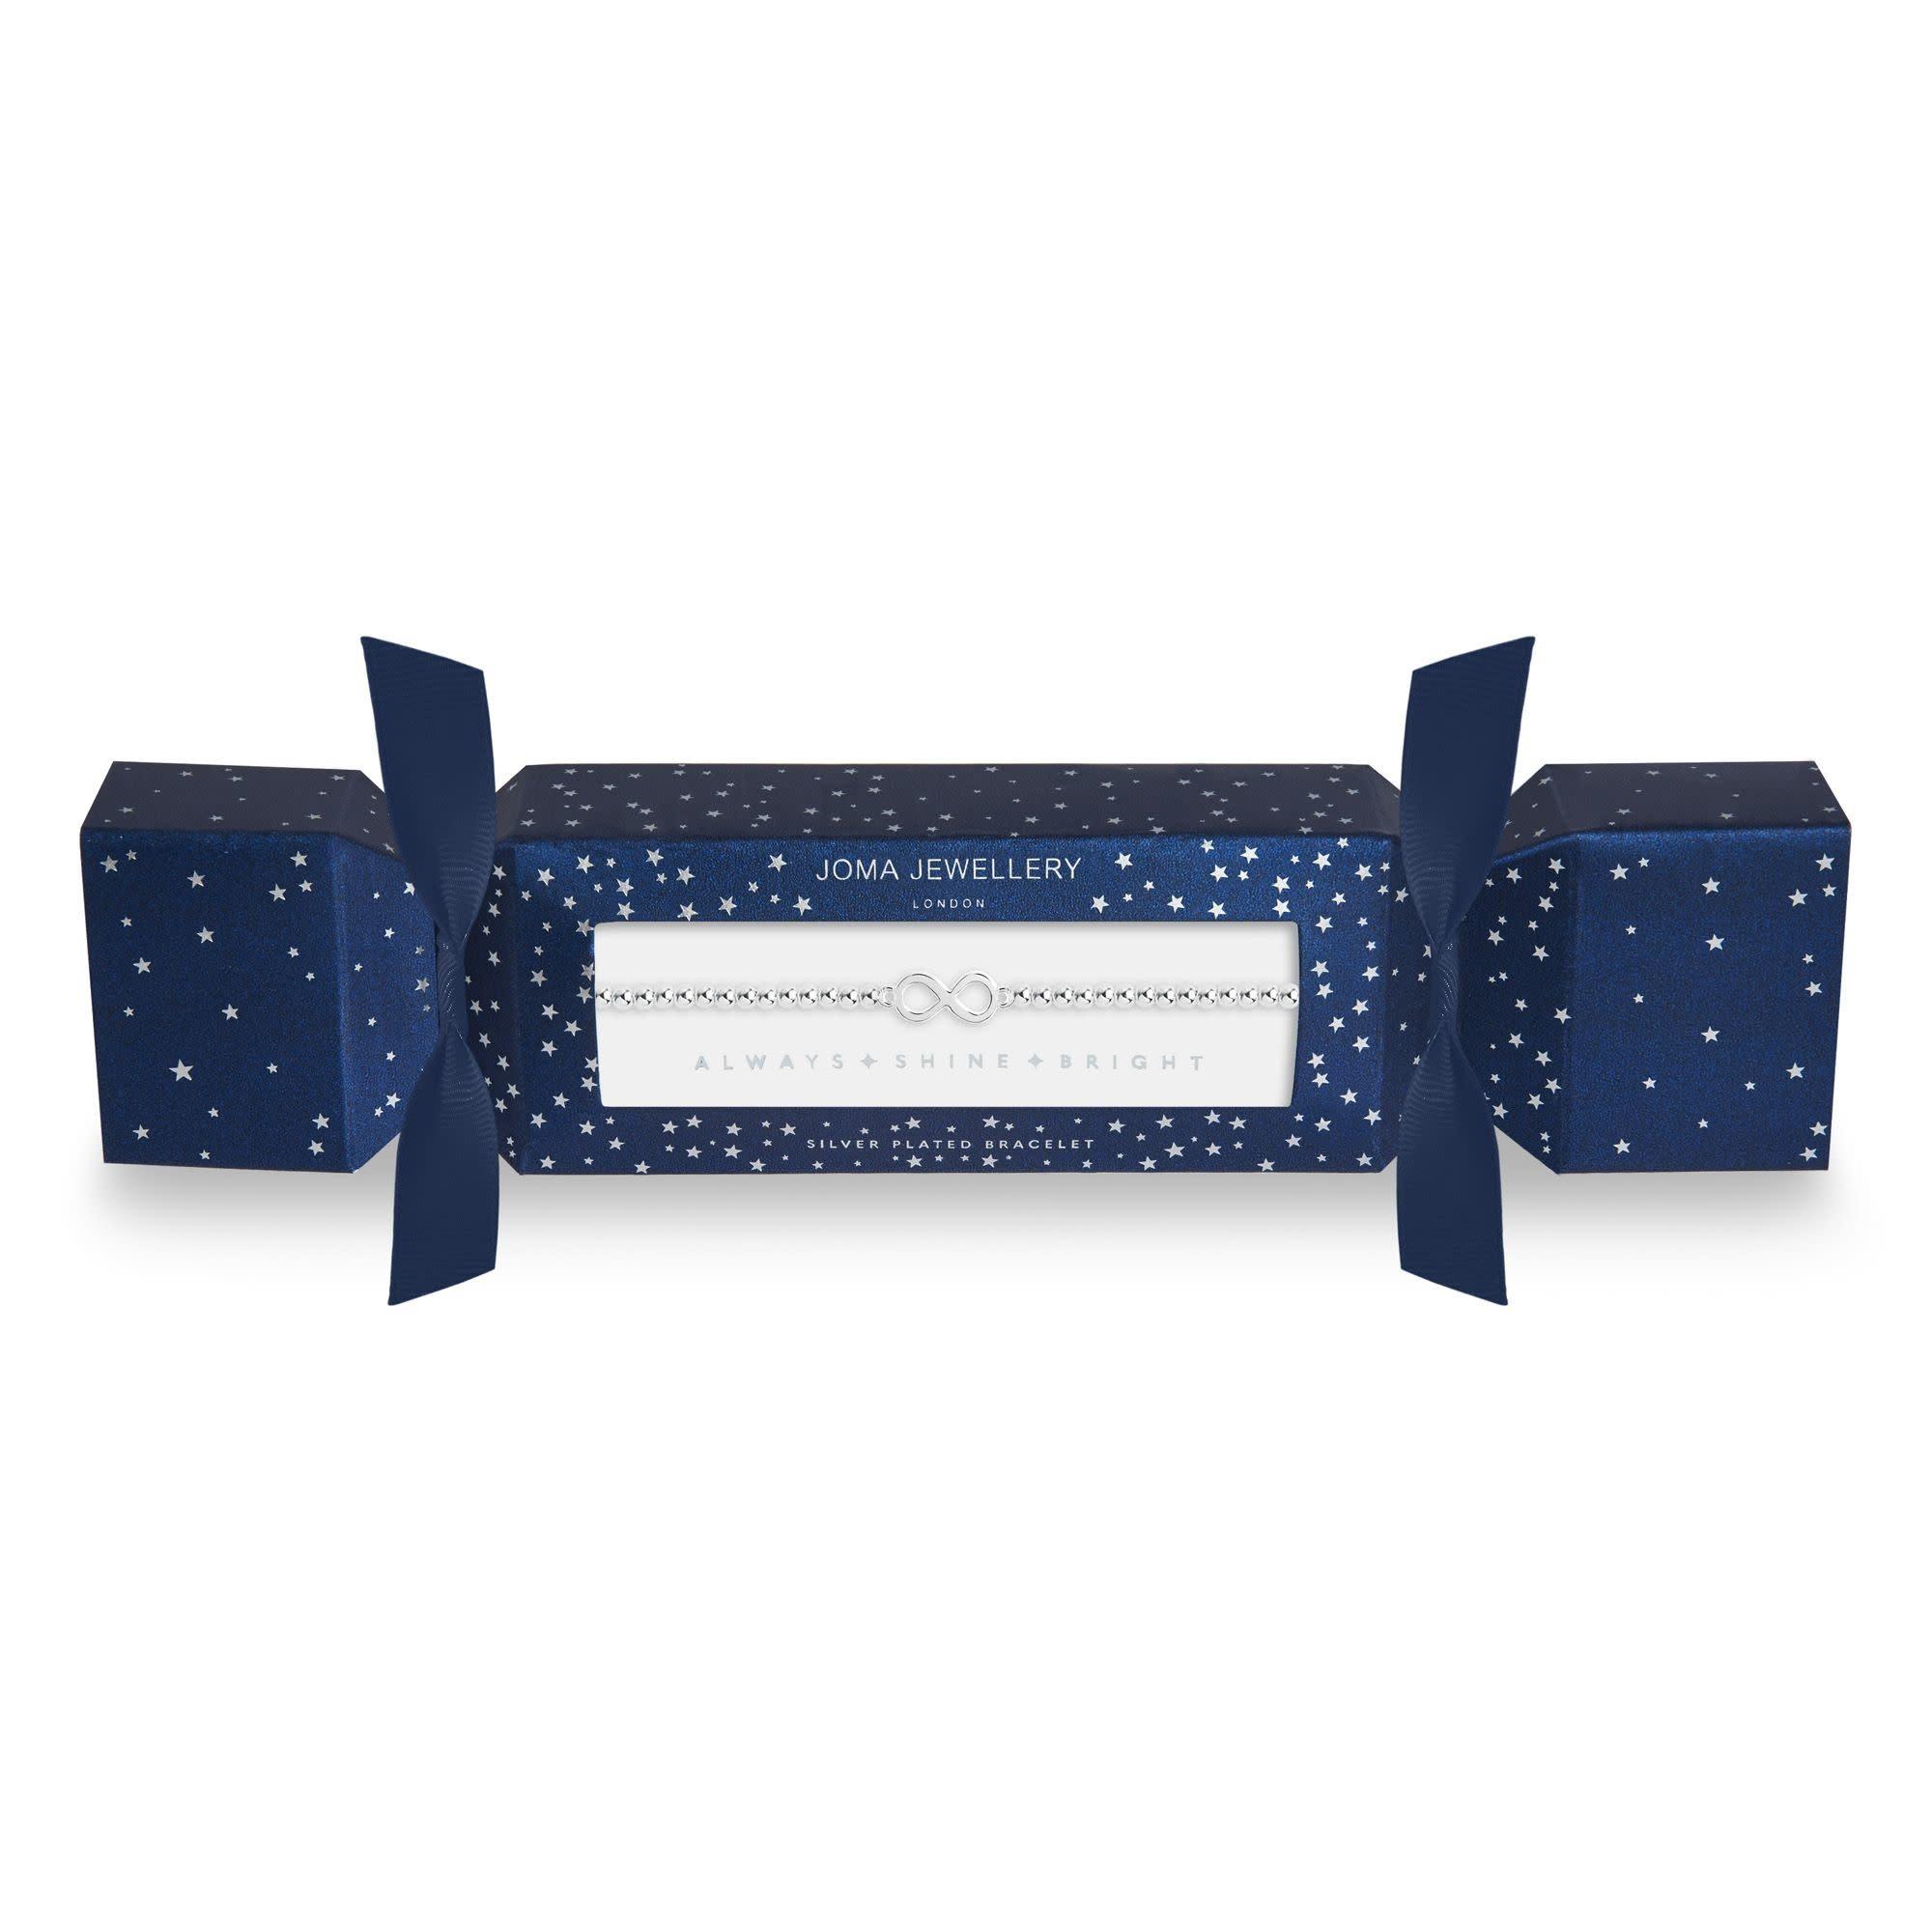 Joma Jewellery Christmas Cracker - Infinity Silver